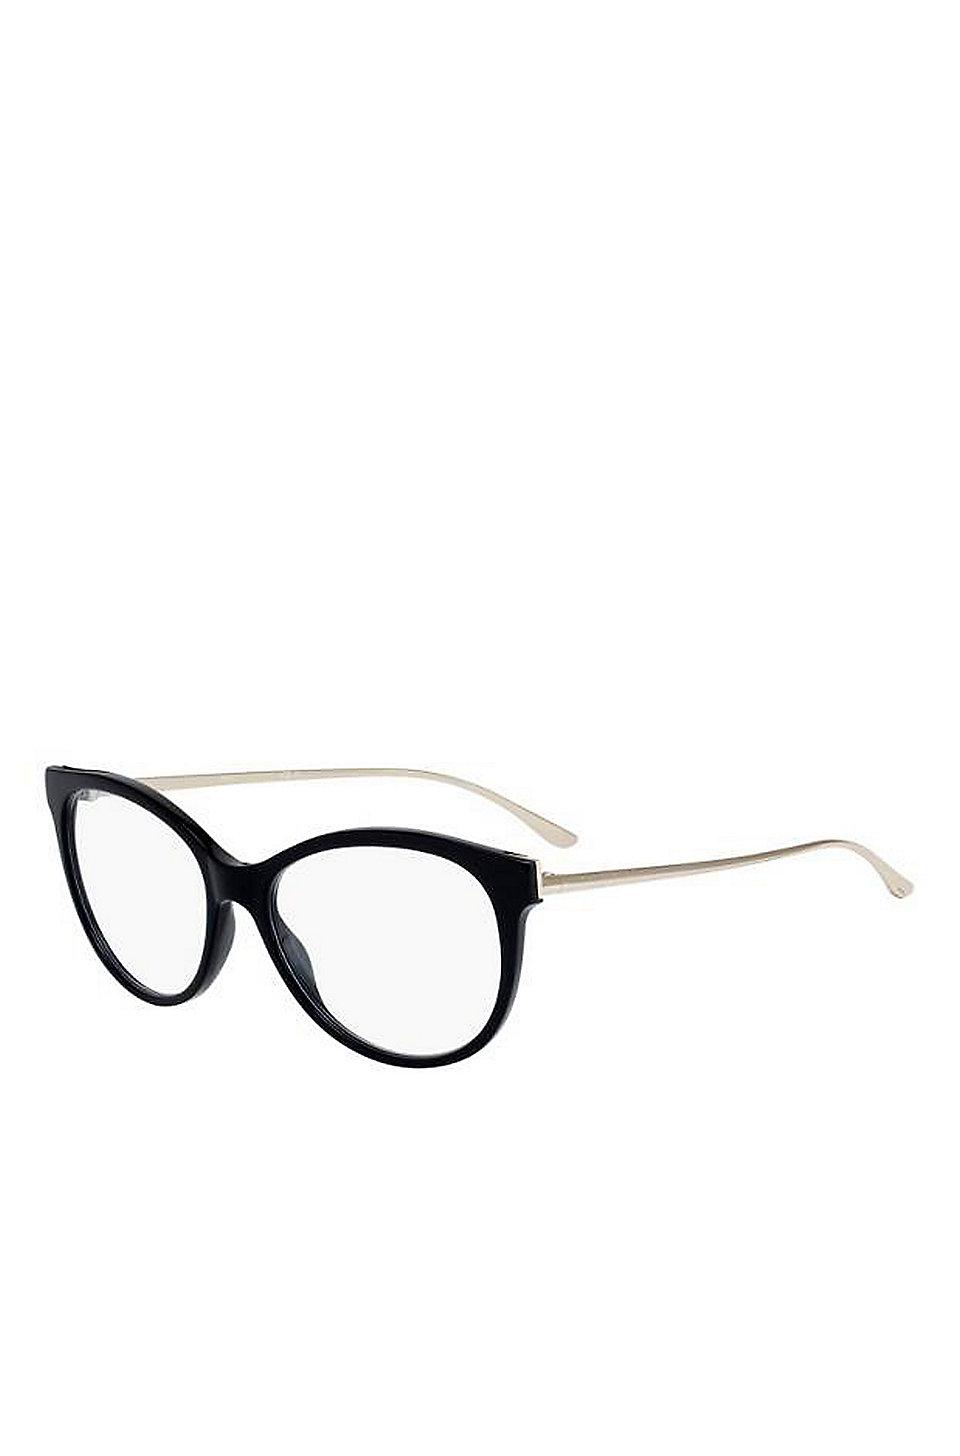 0091023654 BOSS - Black Acetate Cat-Eye Optical Frames